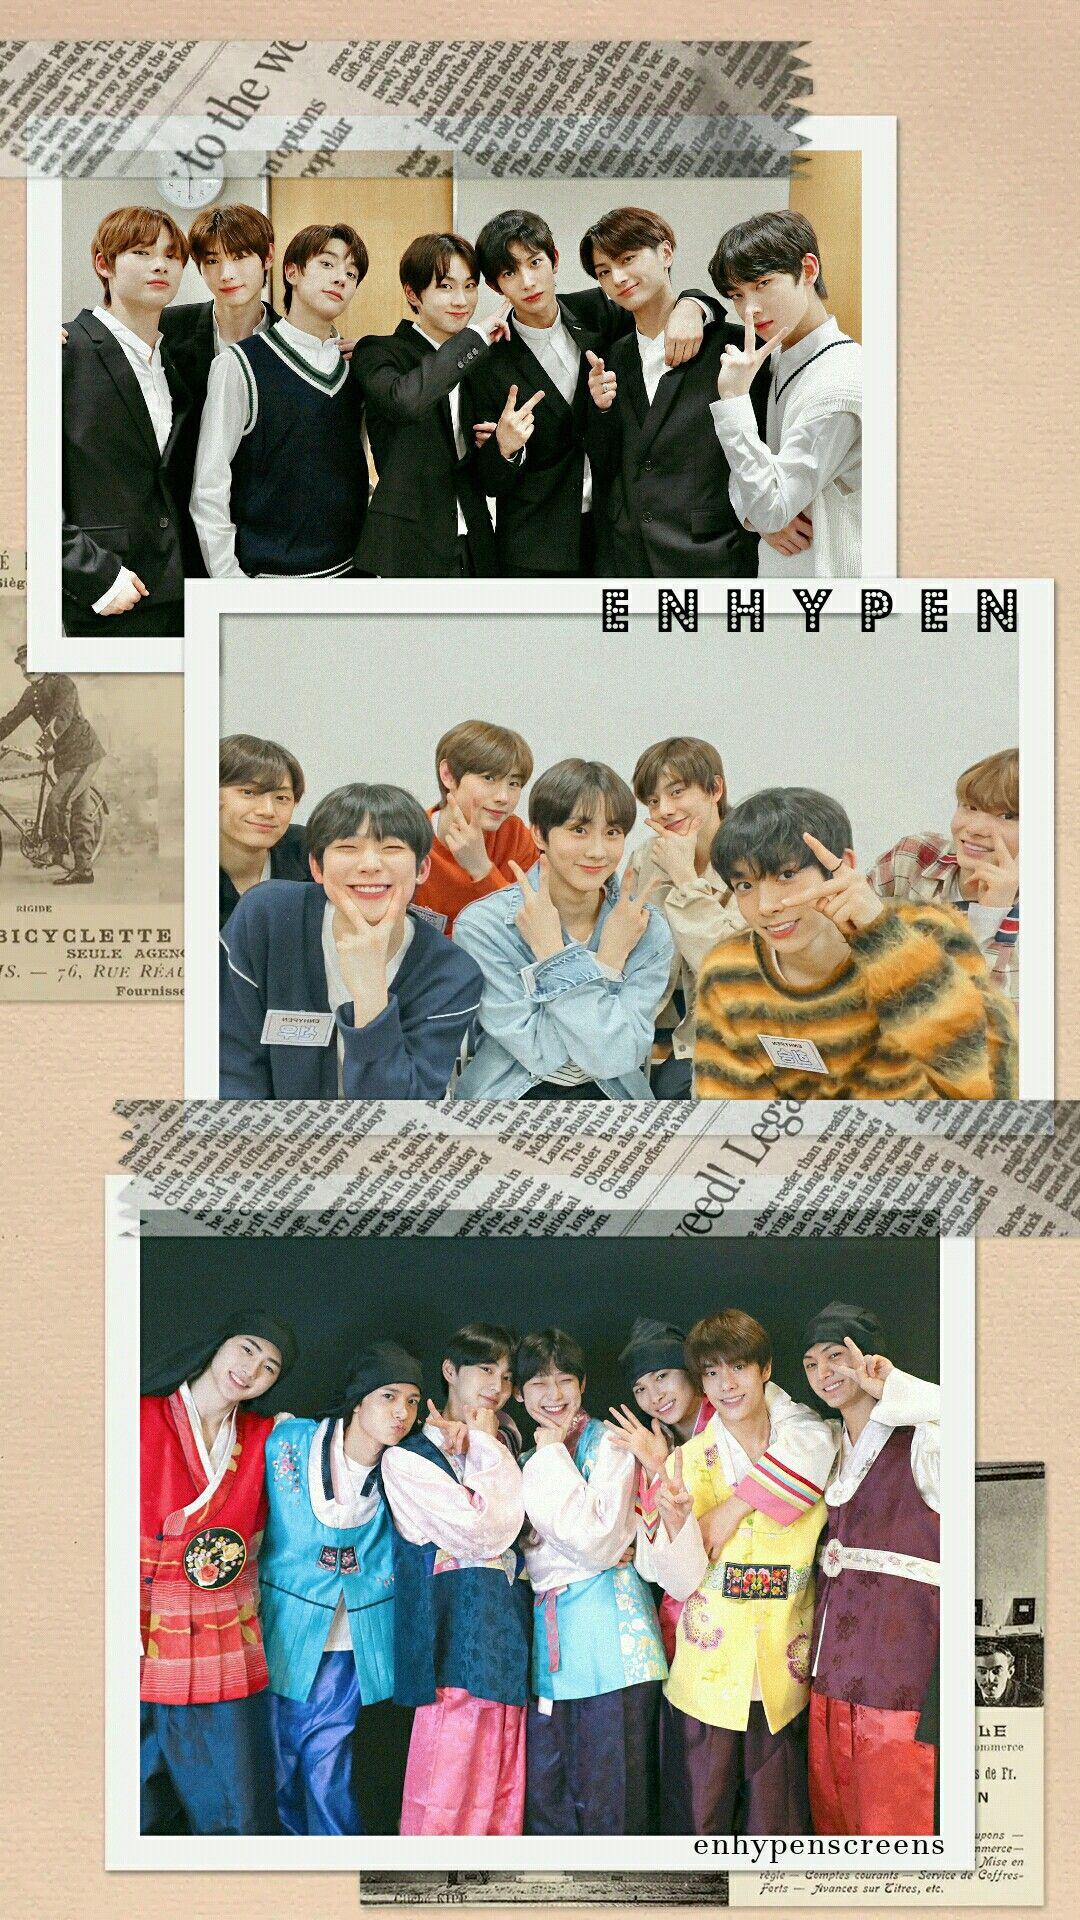 Enhypen Hd Wallpapers Photo Wallpaper Cute Wallpapers Kpop Wallpaper Enhypen logo desktop wallpaper